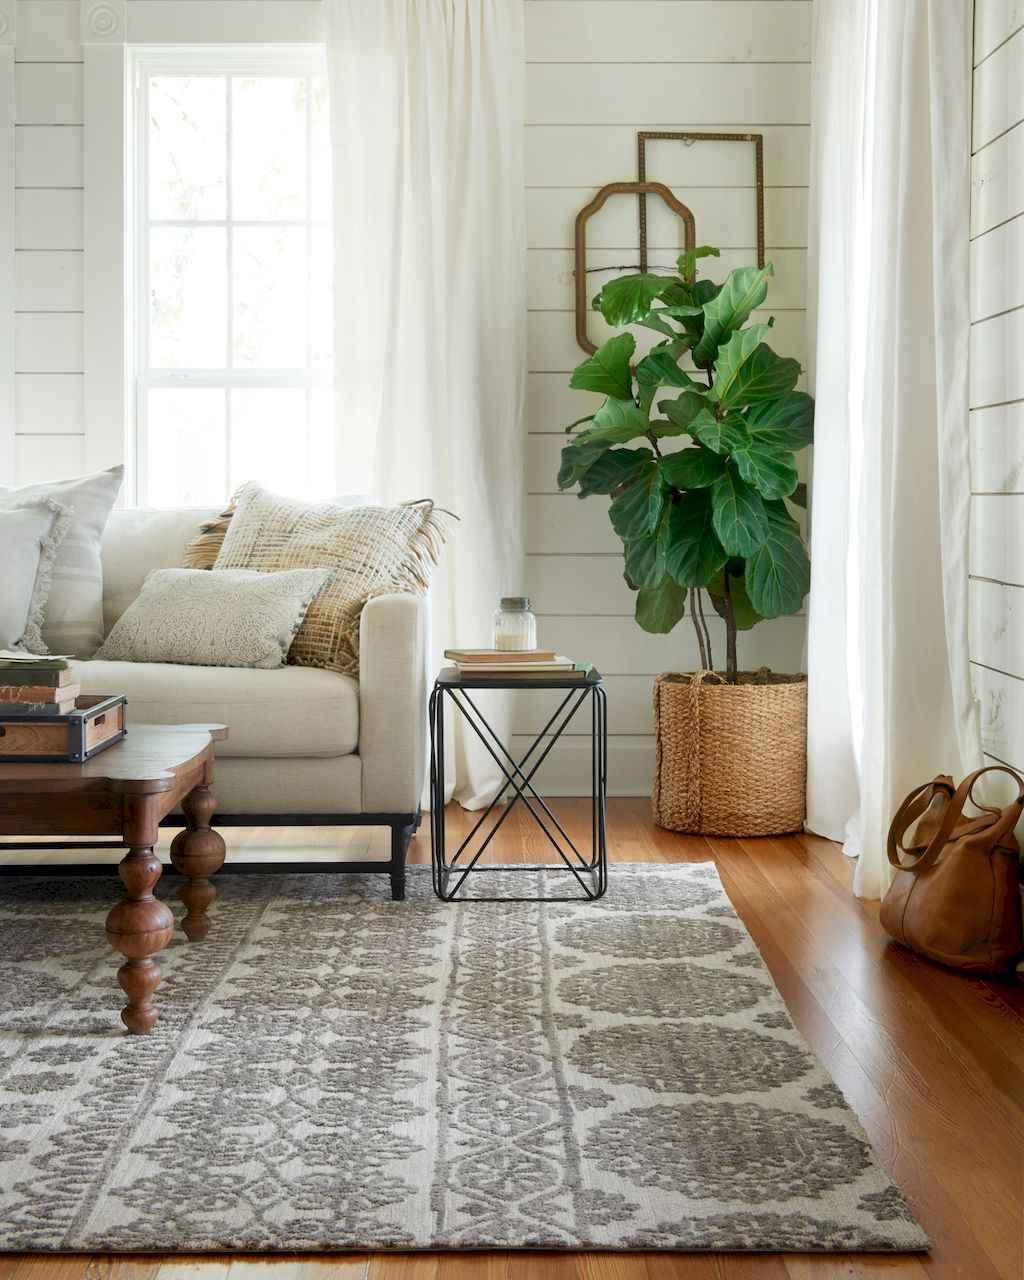 Cool Living Room Decor: 60 Cool Modern Farmhouse Living Room Decor Ideas (19